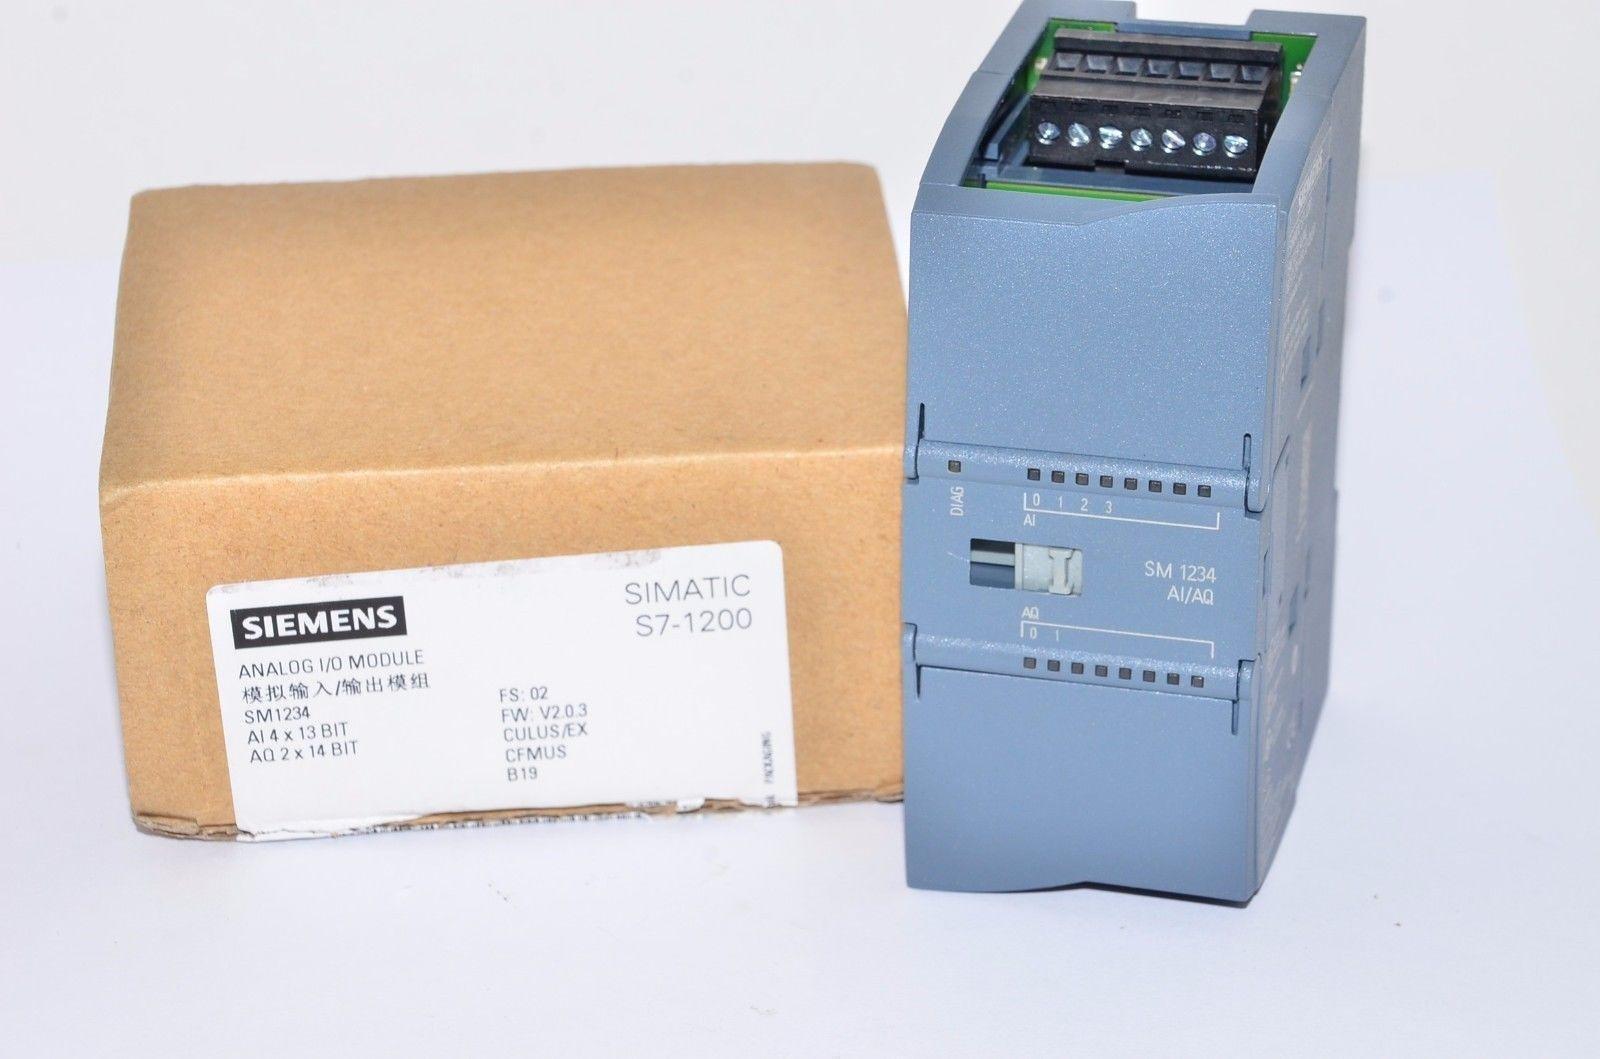 Siemens 6ES7 234-4HE32-0XB0 SIMATIC S7-1200, ANALOG I/O SM 1234, 4 AI / 2 AO, +/-10V, 14 BIT RESOLUTION OR 0(4) - 20 MA, 13 BIT RESOLUTION by Siemens